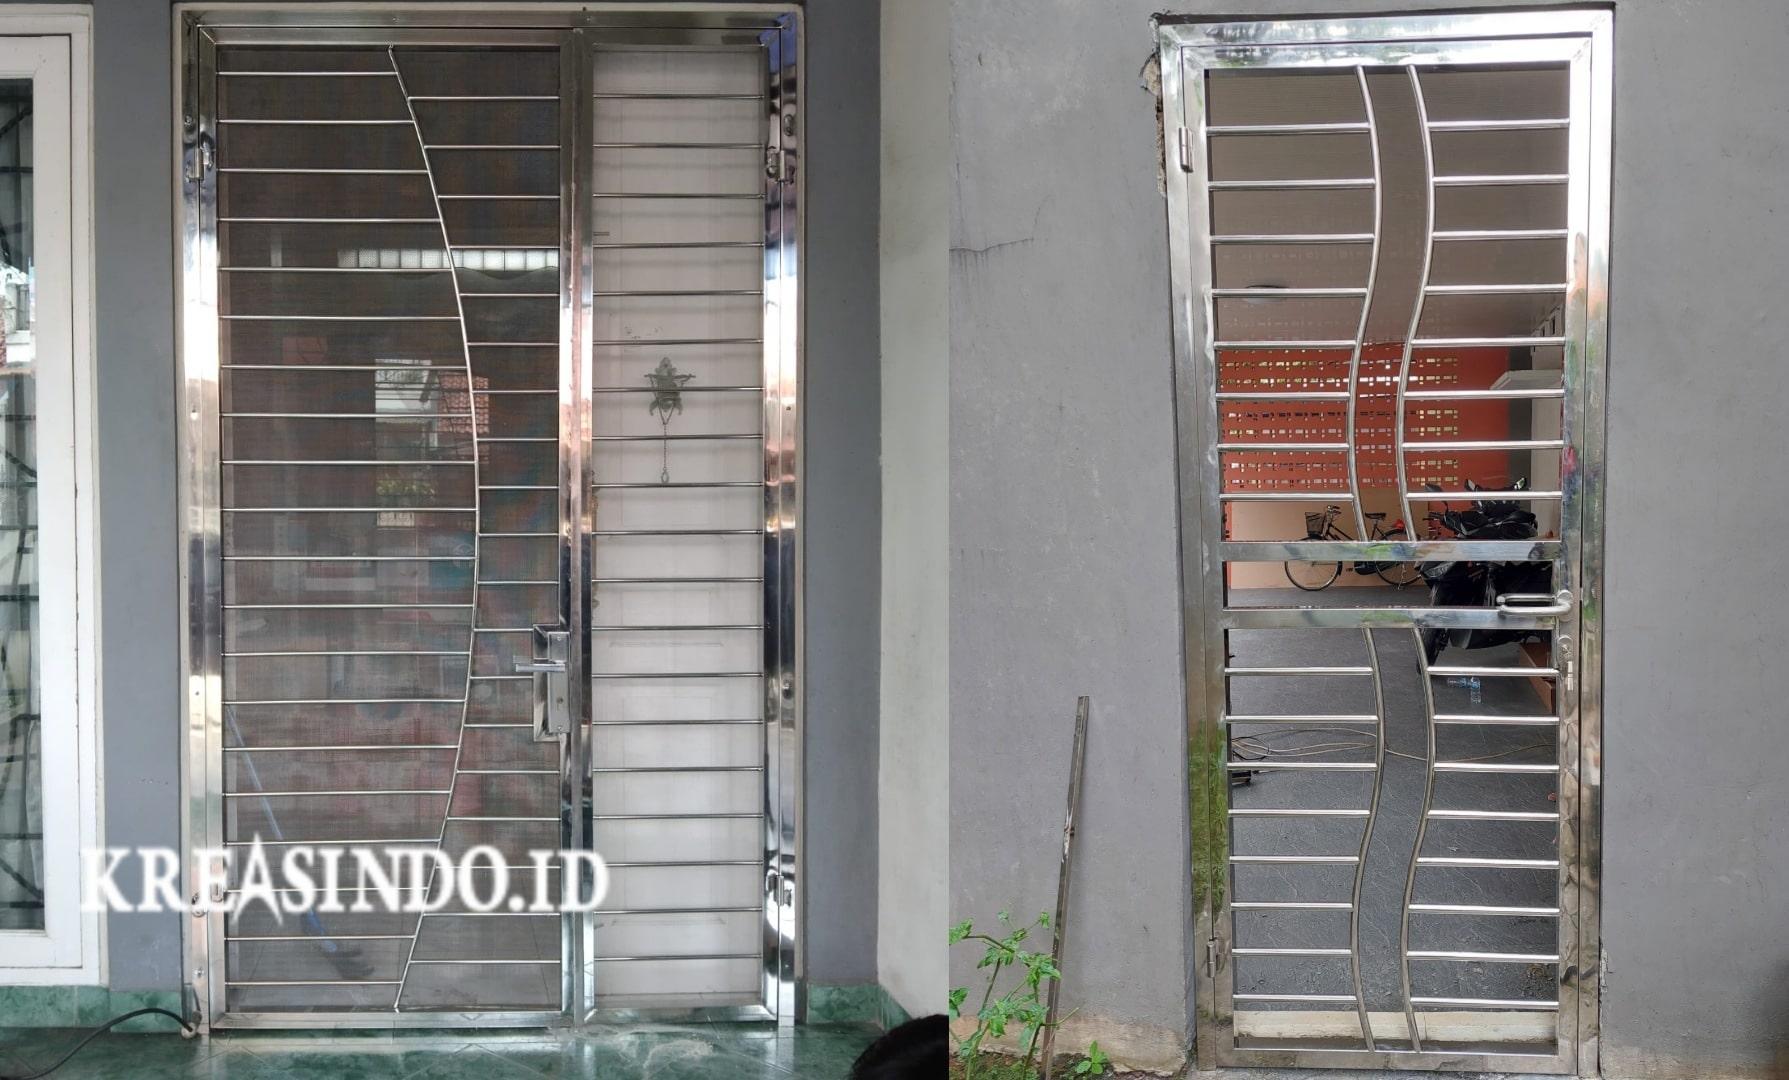 Harga Pintu Kawat Nyamuk Teralis Stainless Terbaru [ Upadate Juli 2021 ]